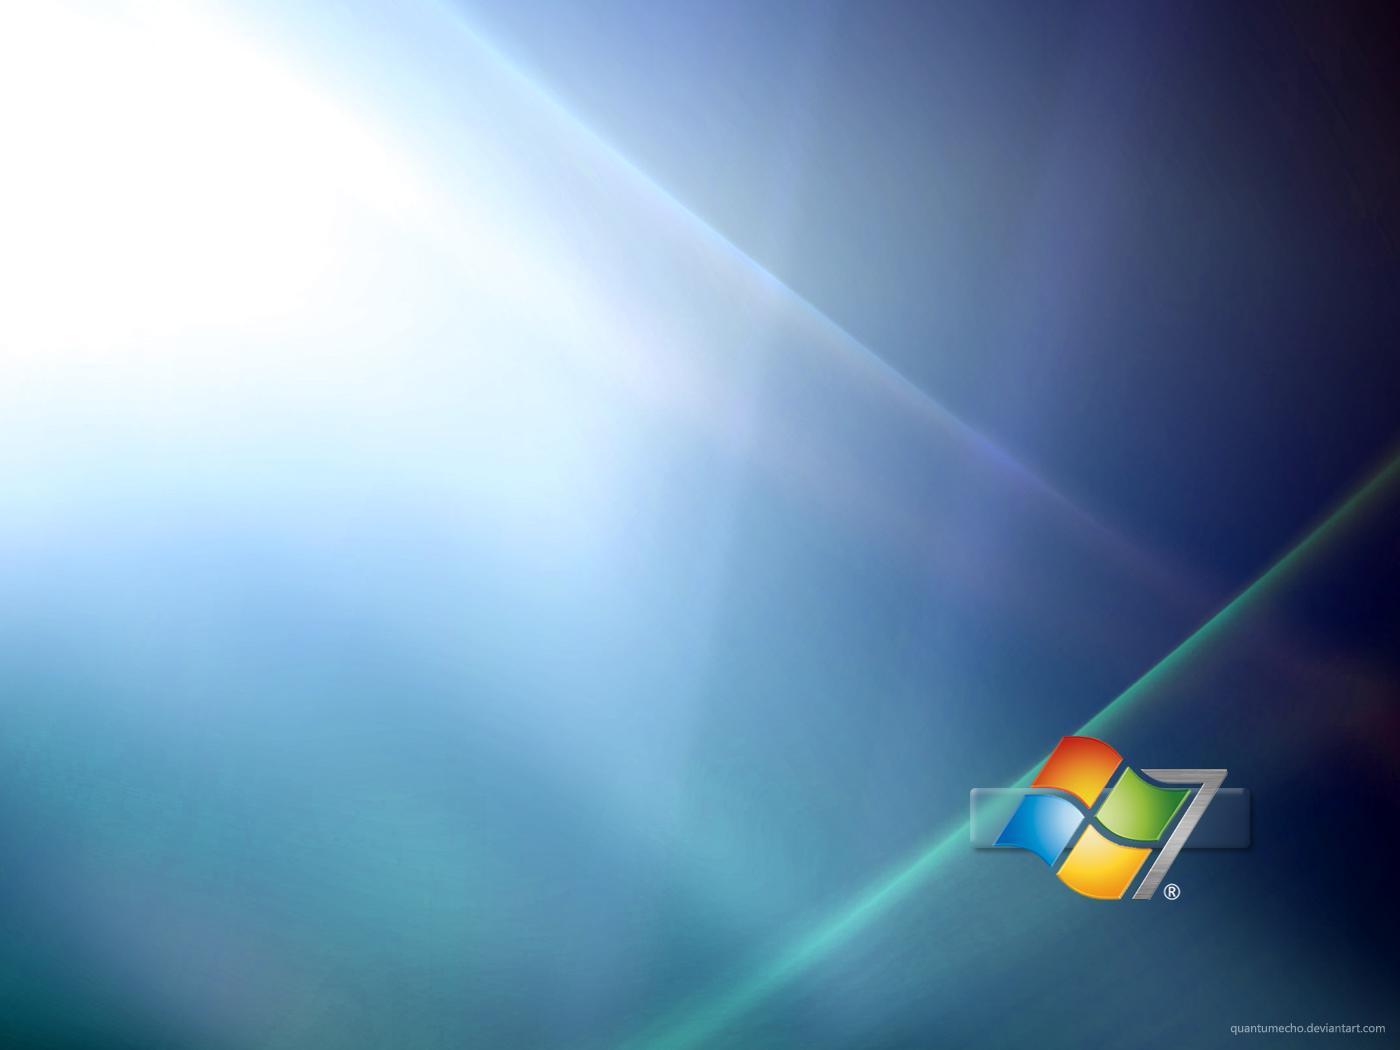 Windows 10 high quality wallpaper wallpapersafari for High quality windows